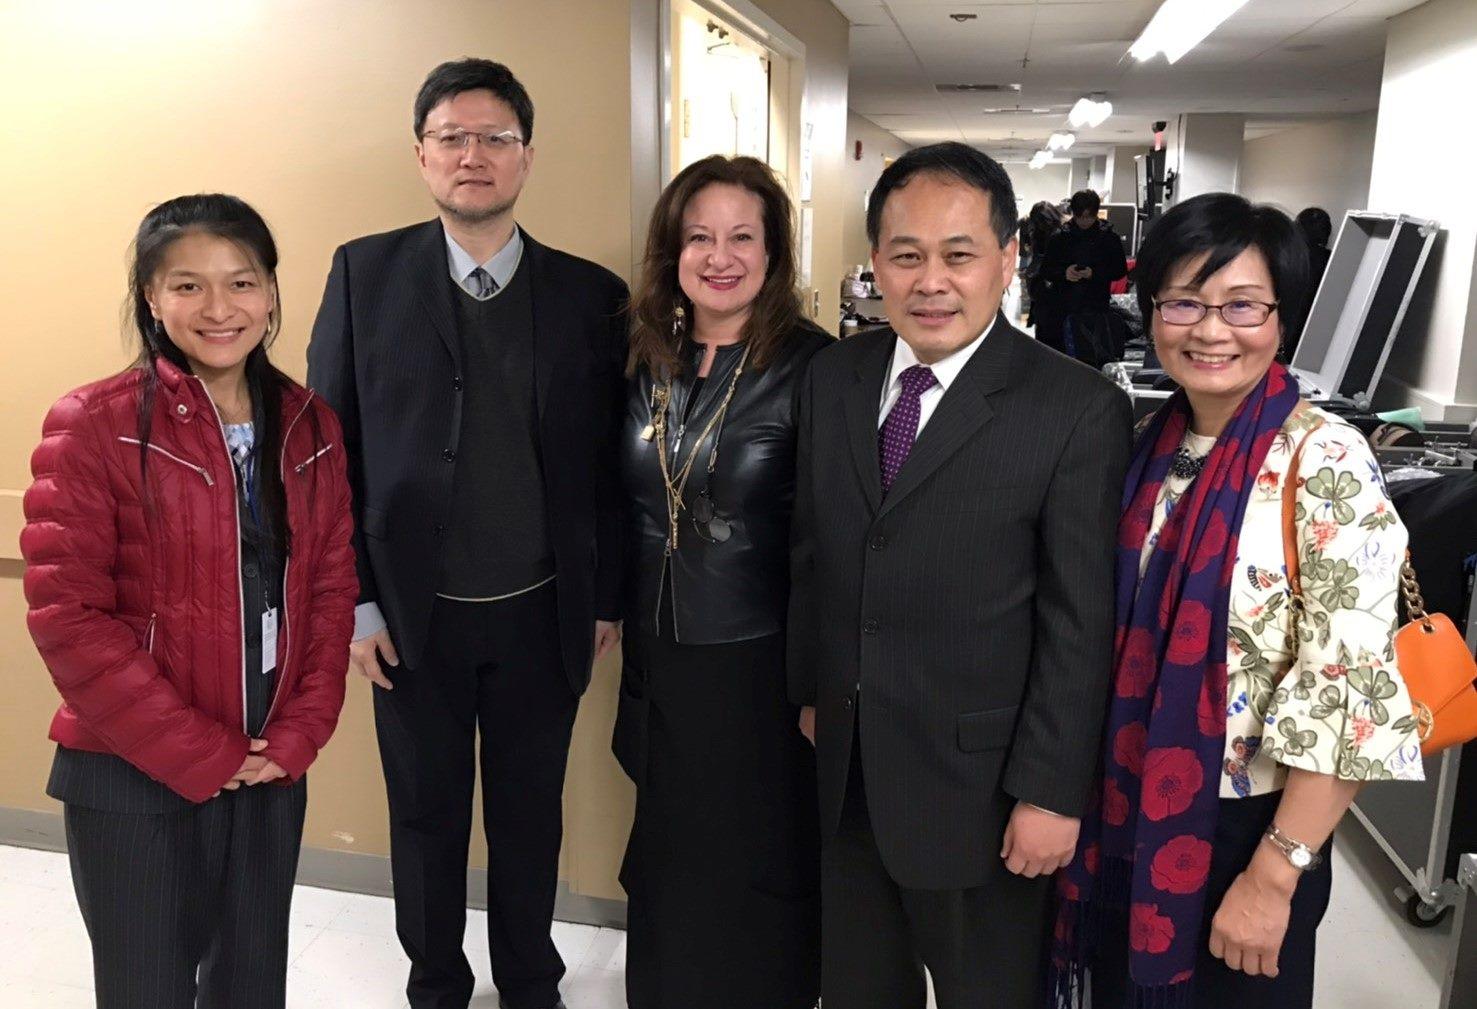 WPA執行長Jenny Bilfield、駐美台北經文處副處長黃敏境賢伉儷蒞臨音樂會